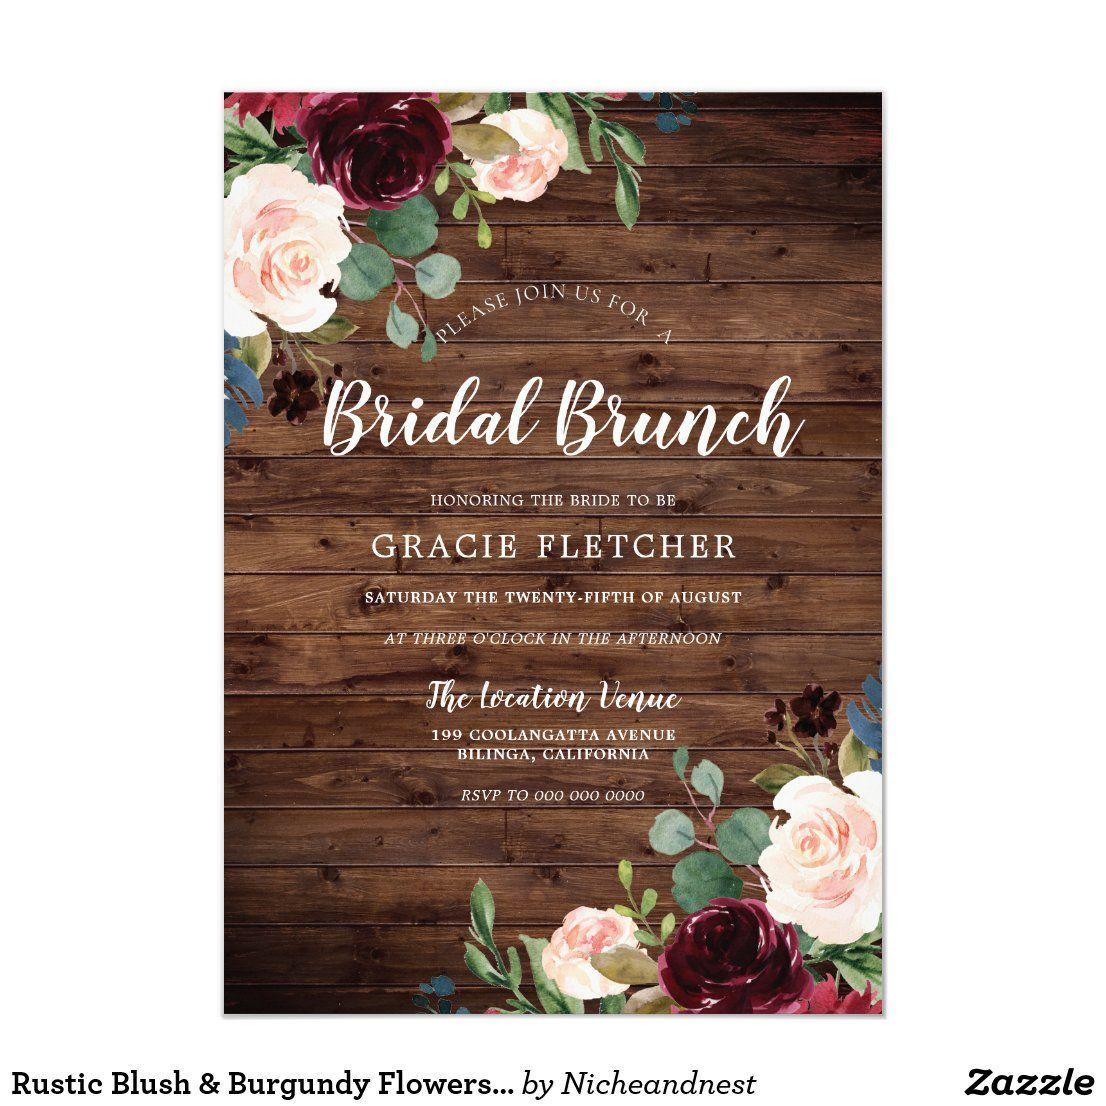 Rustic Blush & Burgundy Flowers Bridal Shower Invitation